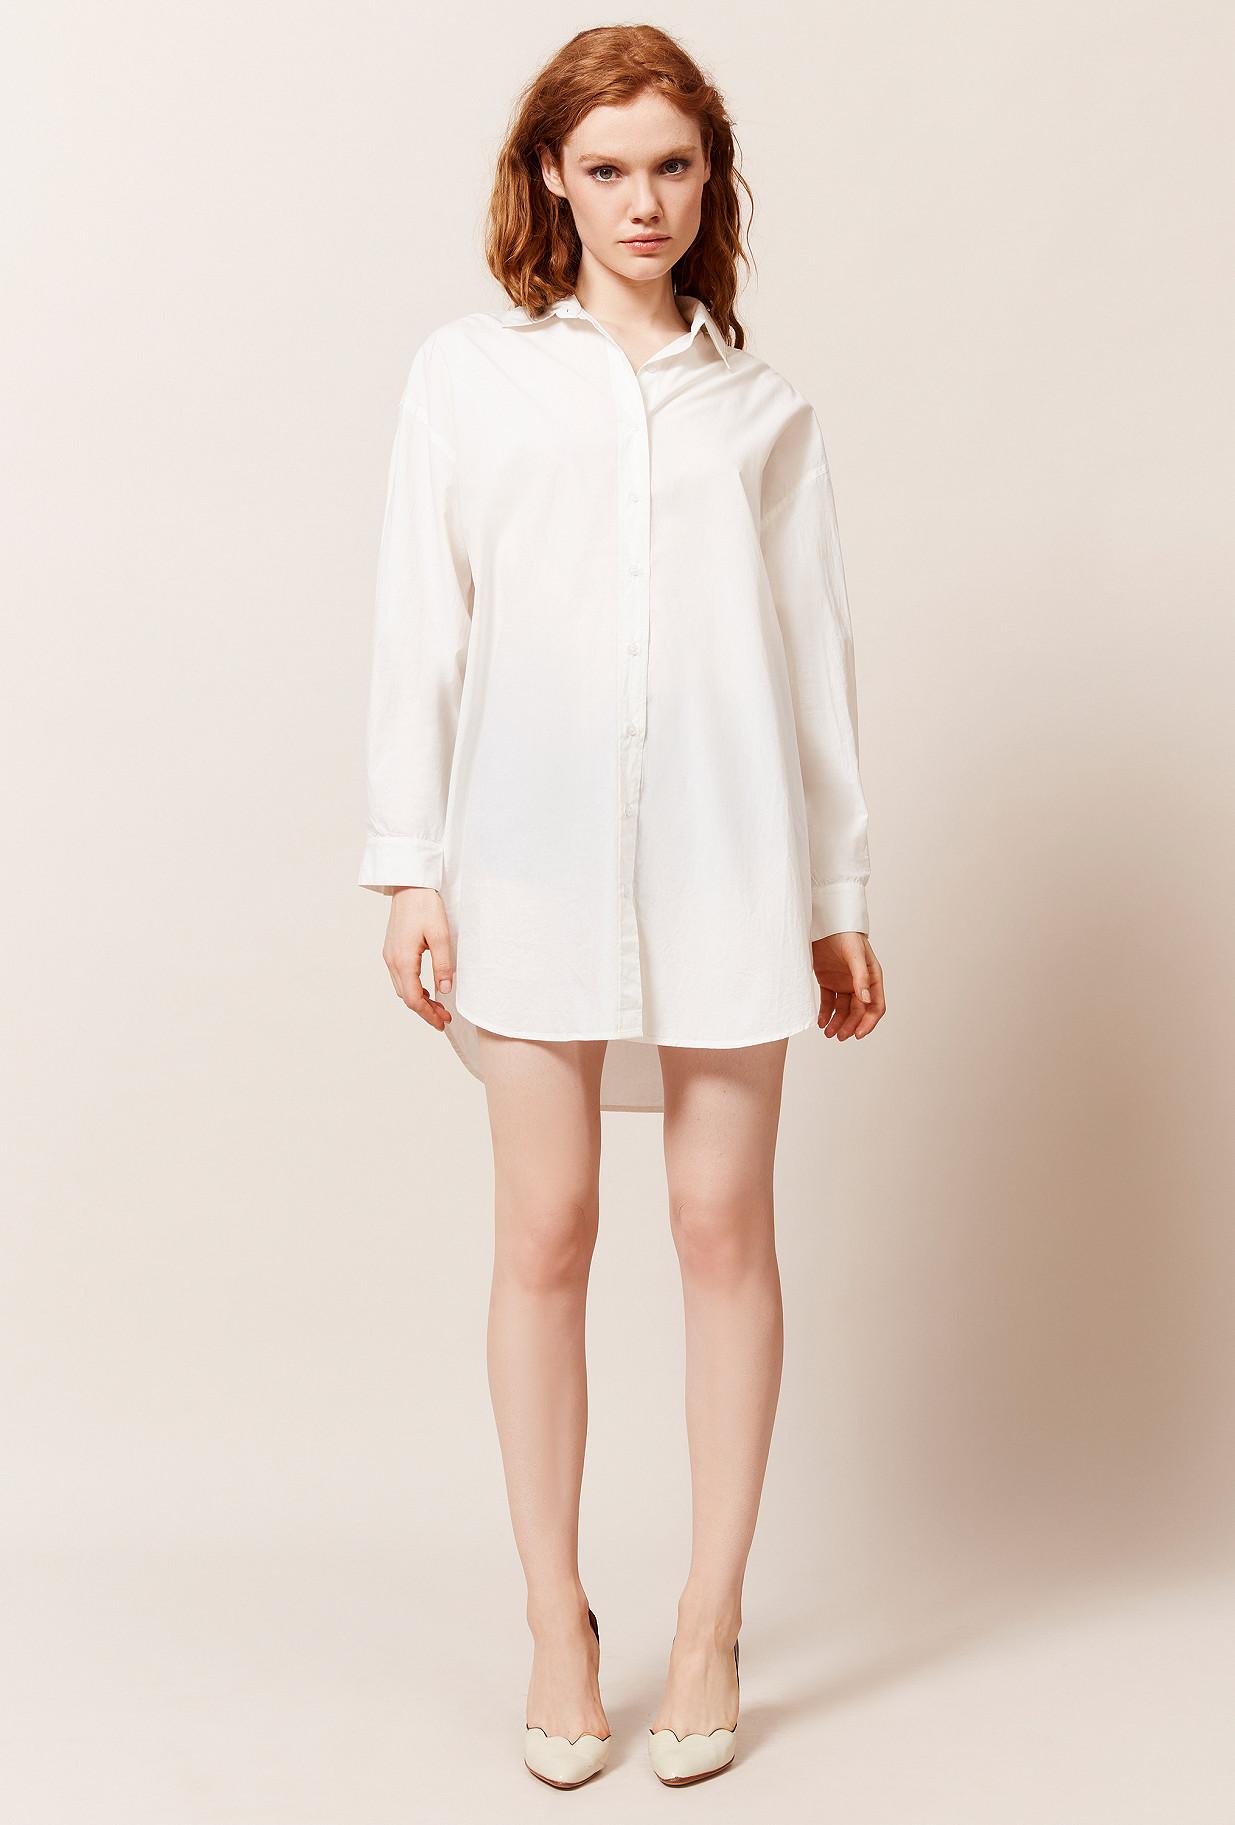 Paris clothes store Shirt  Kamiseta french designer fashion Paris